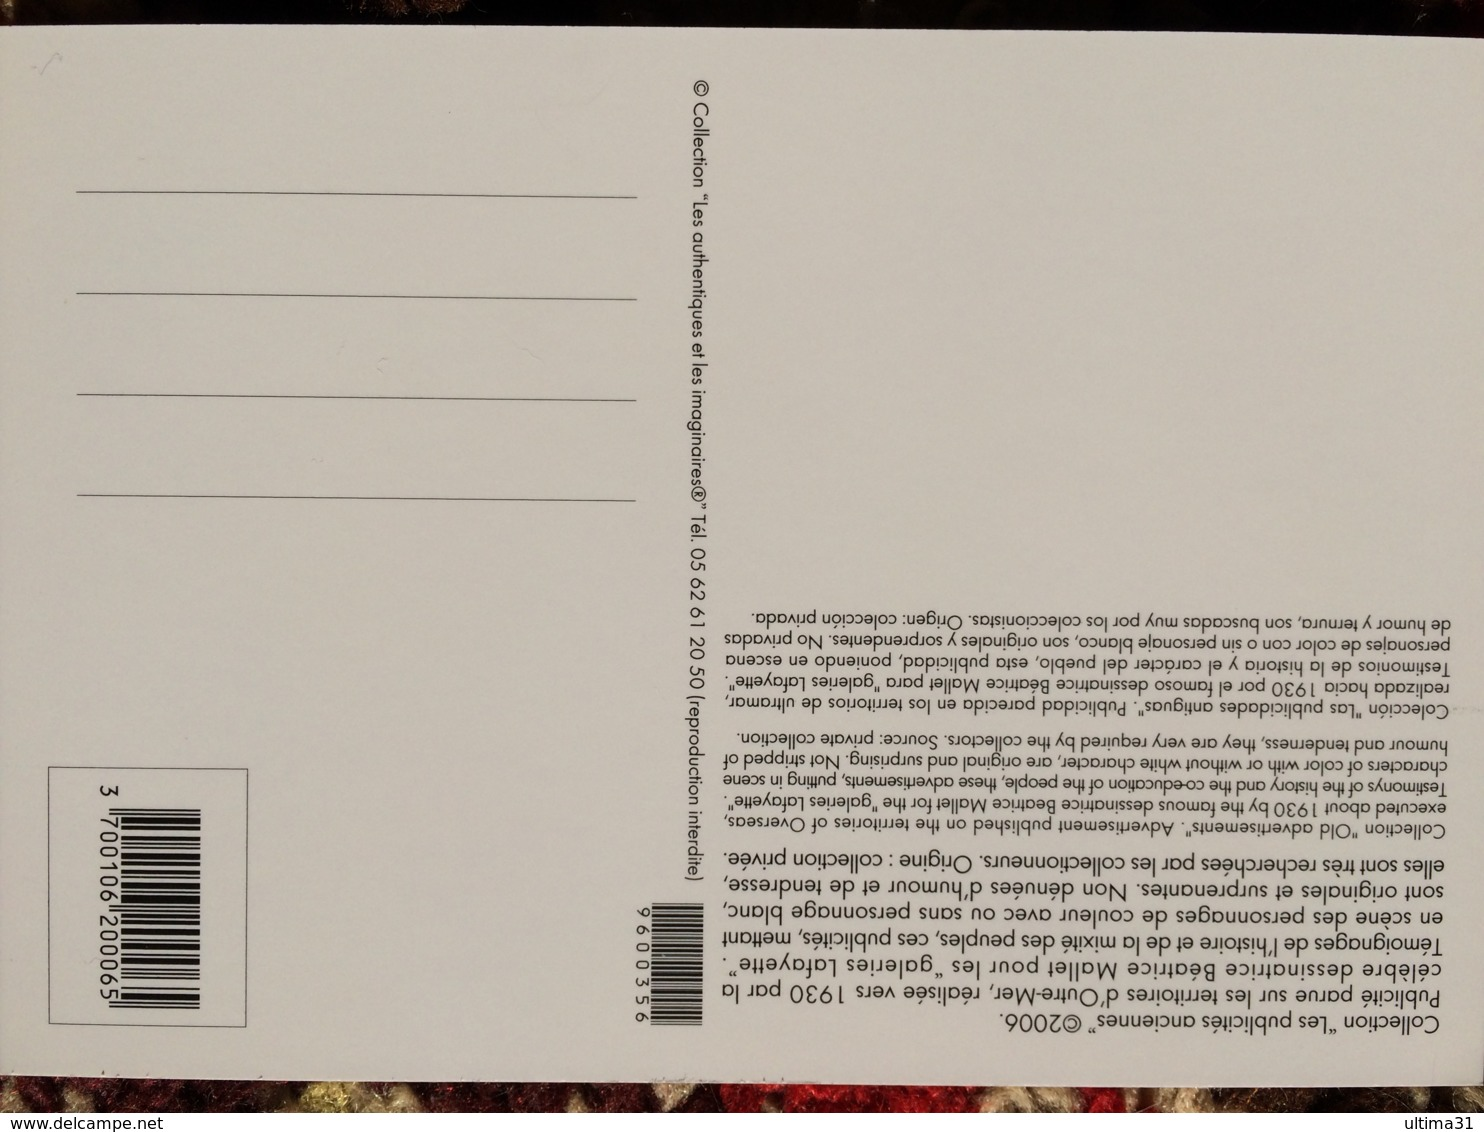 CPM PUB PUBLICITE ANCIENNES GALERIES LAFAYETTE BONHOMME SINGE MALLETCOLLEC AUTHENTIQUES IMAGINAIRES 2005 - Pubblicitari